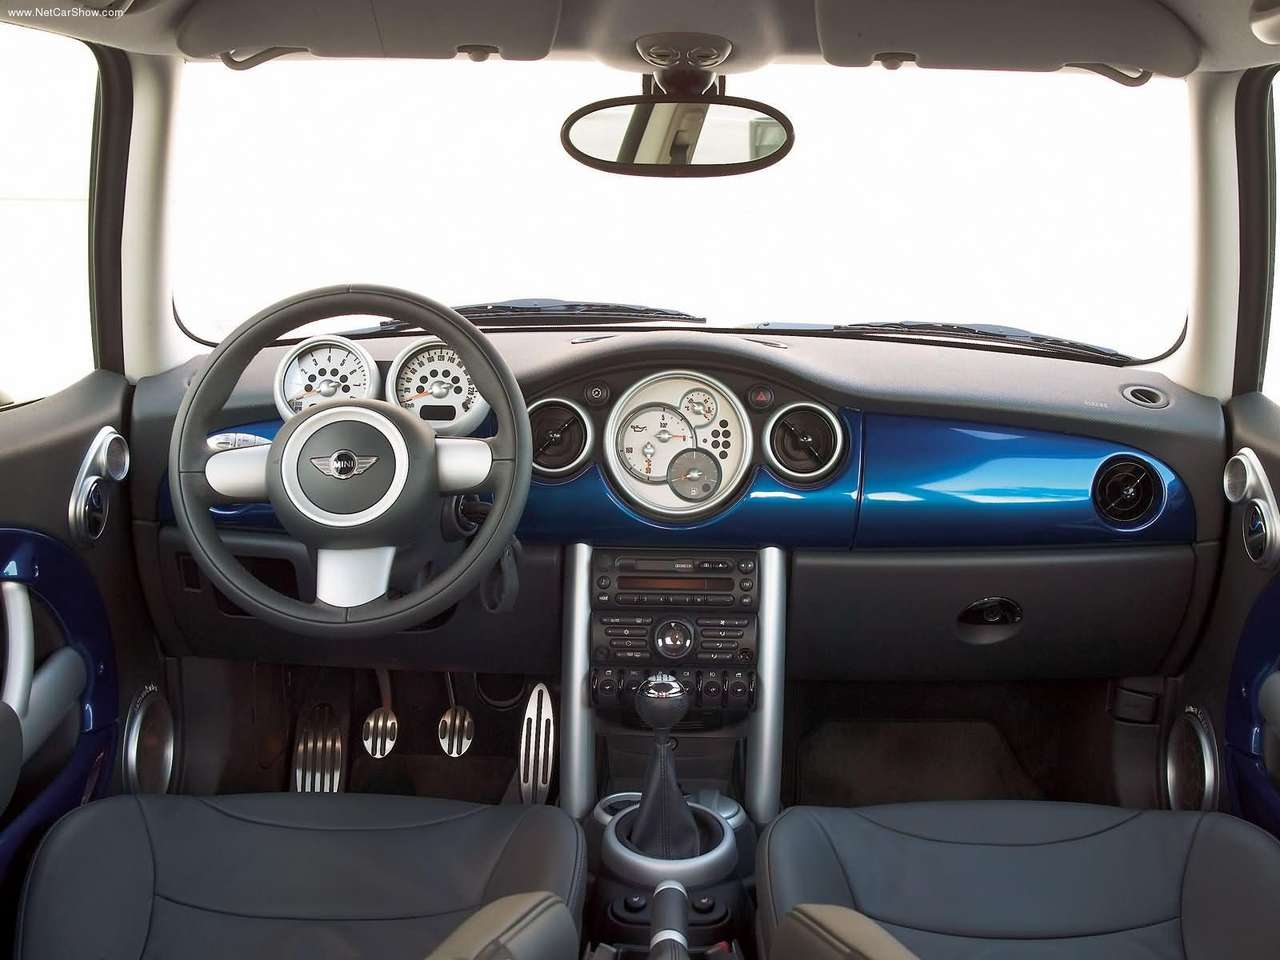 mini cooper s, mini, cooper, cooper s, hot hatch, bmw, german, oxford, motoring, automotive, cars, john cooper, supercharger, supercharged, motoring, automotive, retro car, classic car, austin mini, rover mini, italian job